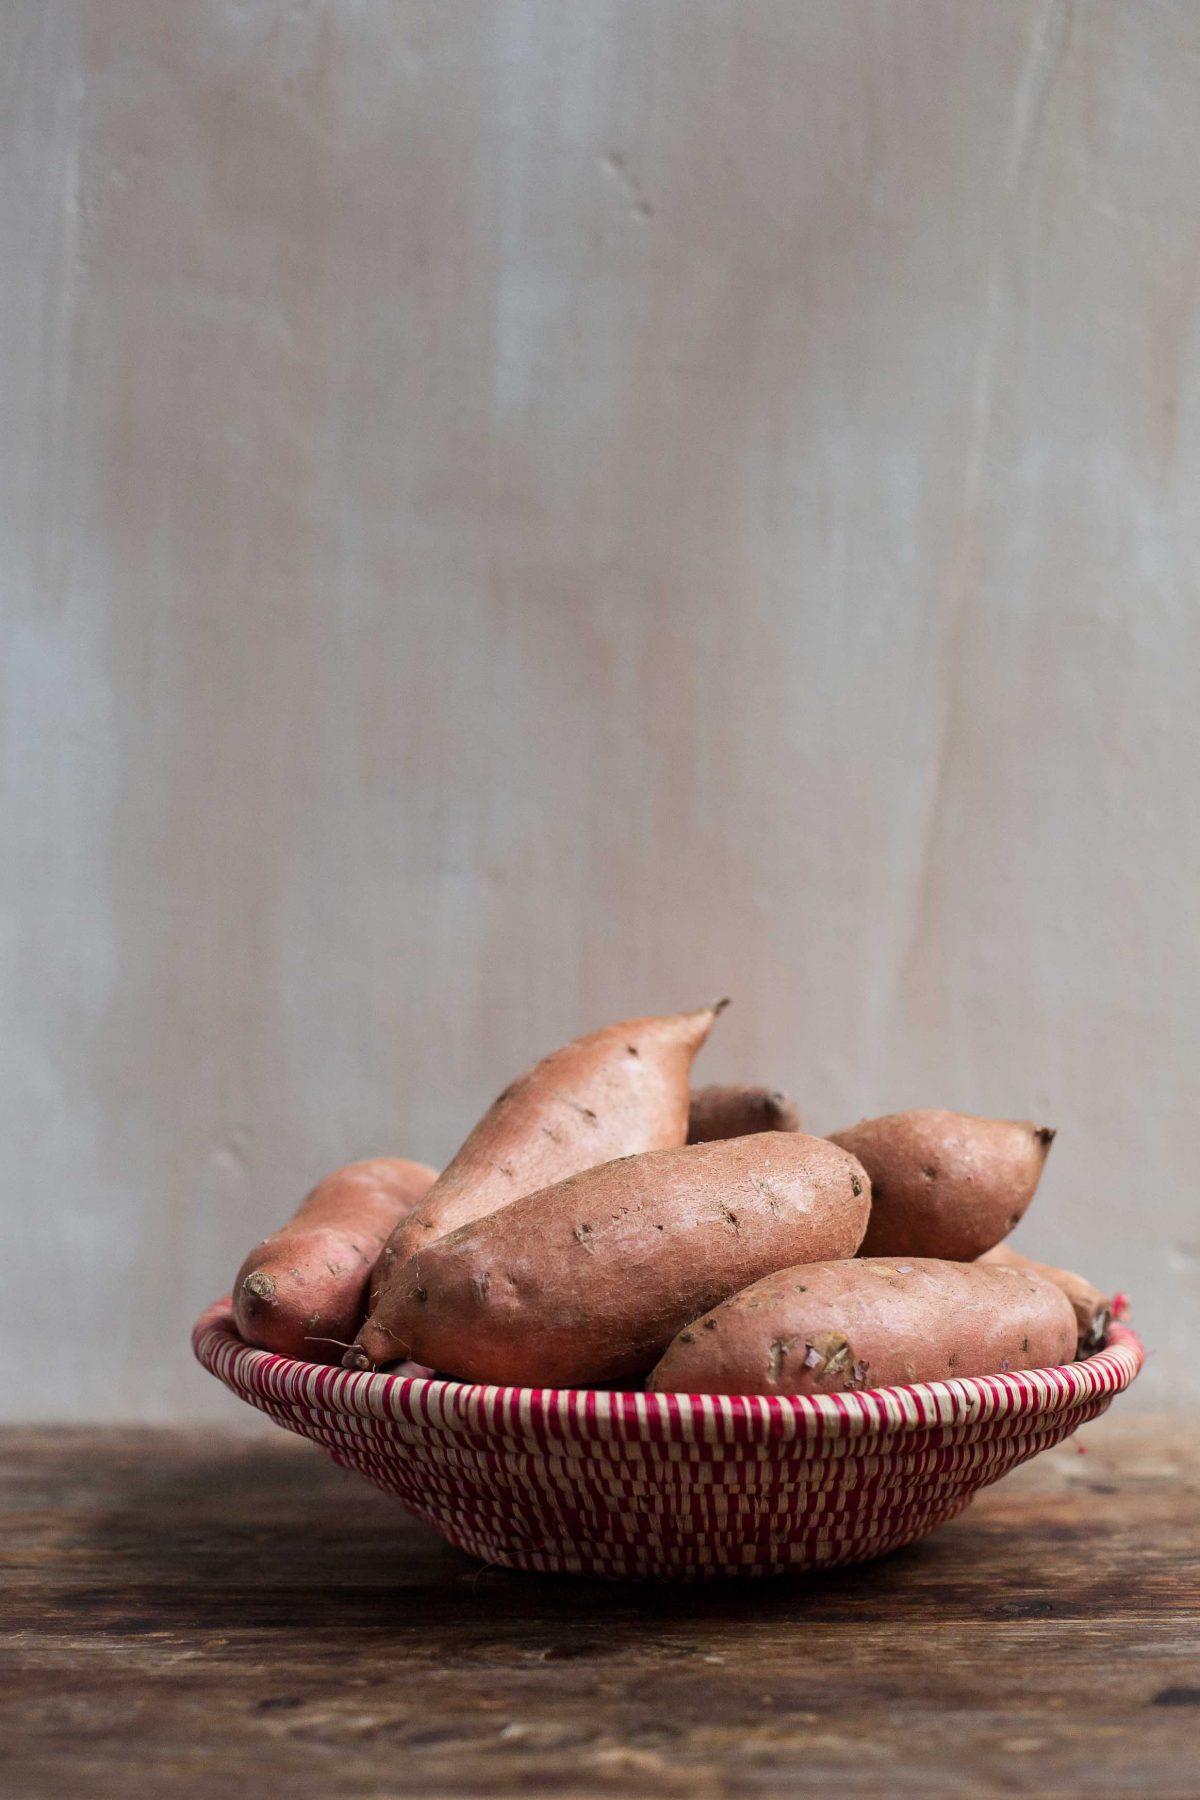 Stuffed Sweet Potatoes 6 Ways